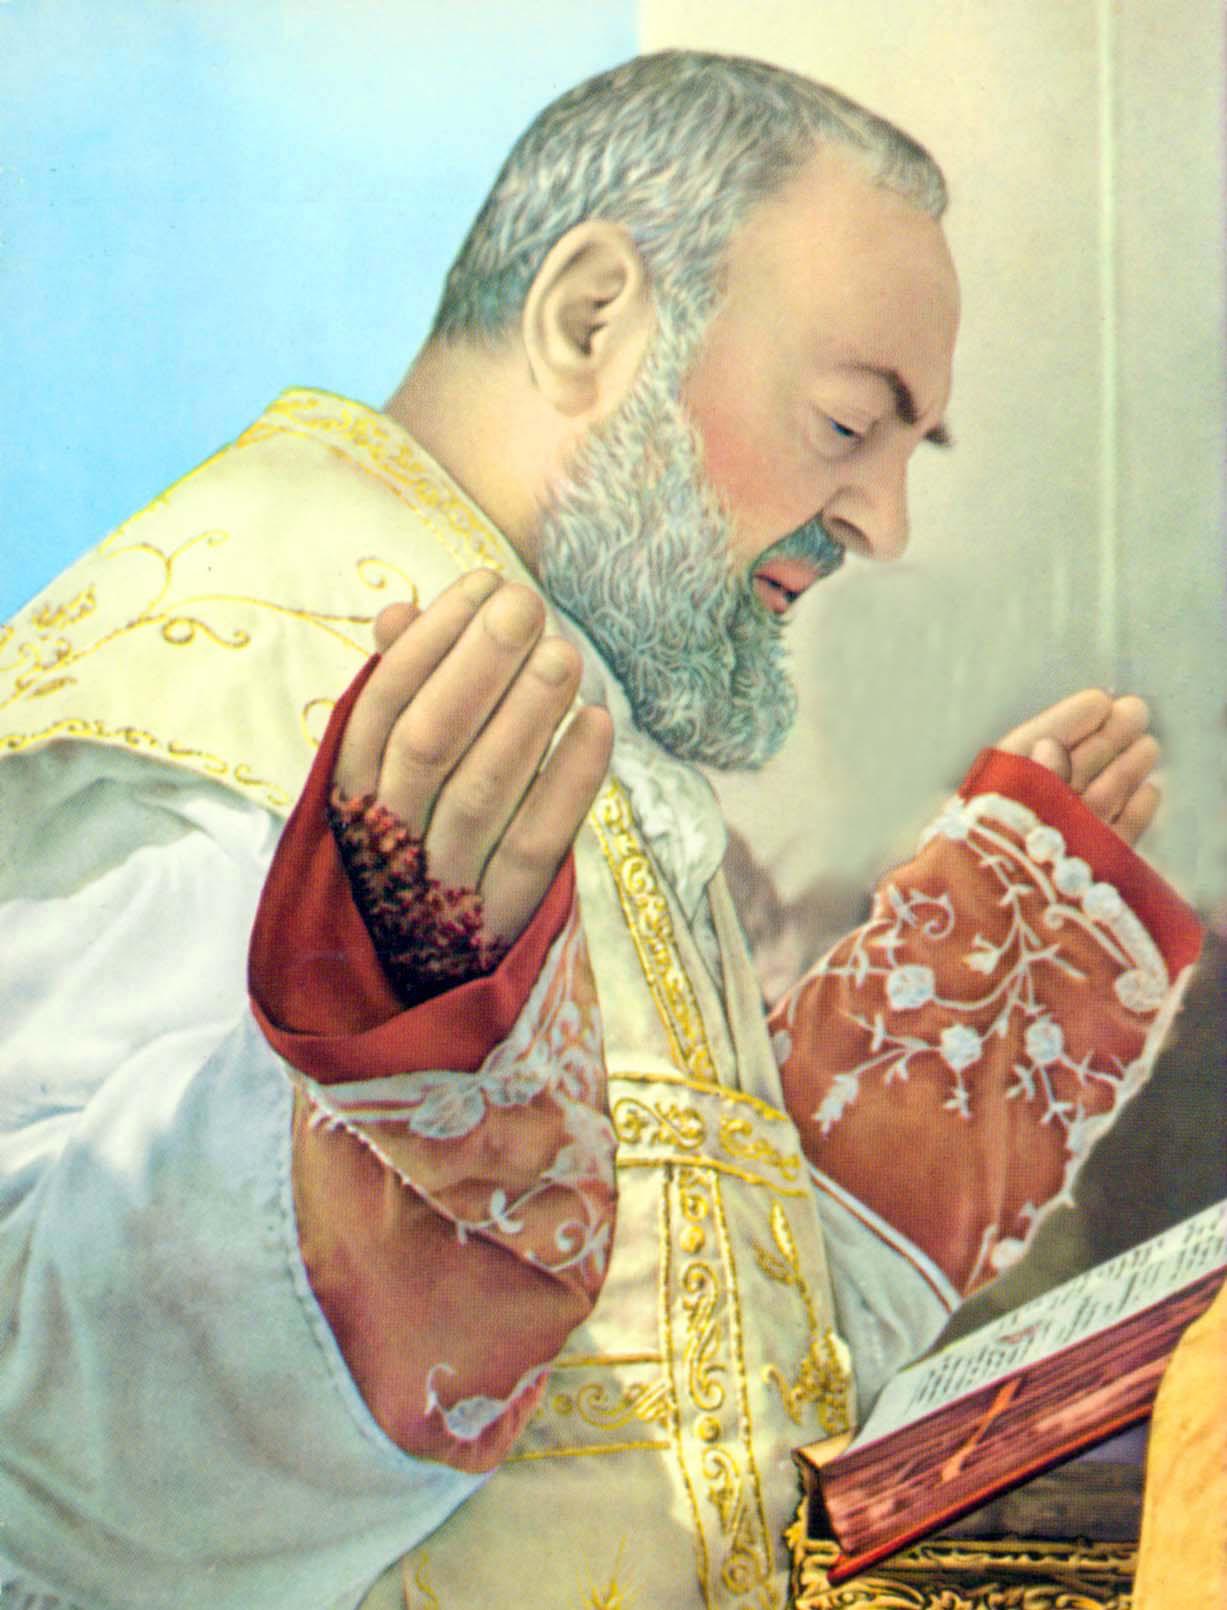 "<a href=""san-pio-da-pietrelcina/"" title=""San Pio da Pietrelcina"">San Pio da Pietrelcina<br><br>Vedi altro</a>"